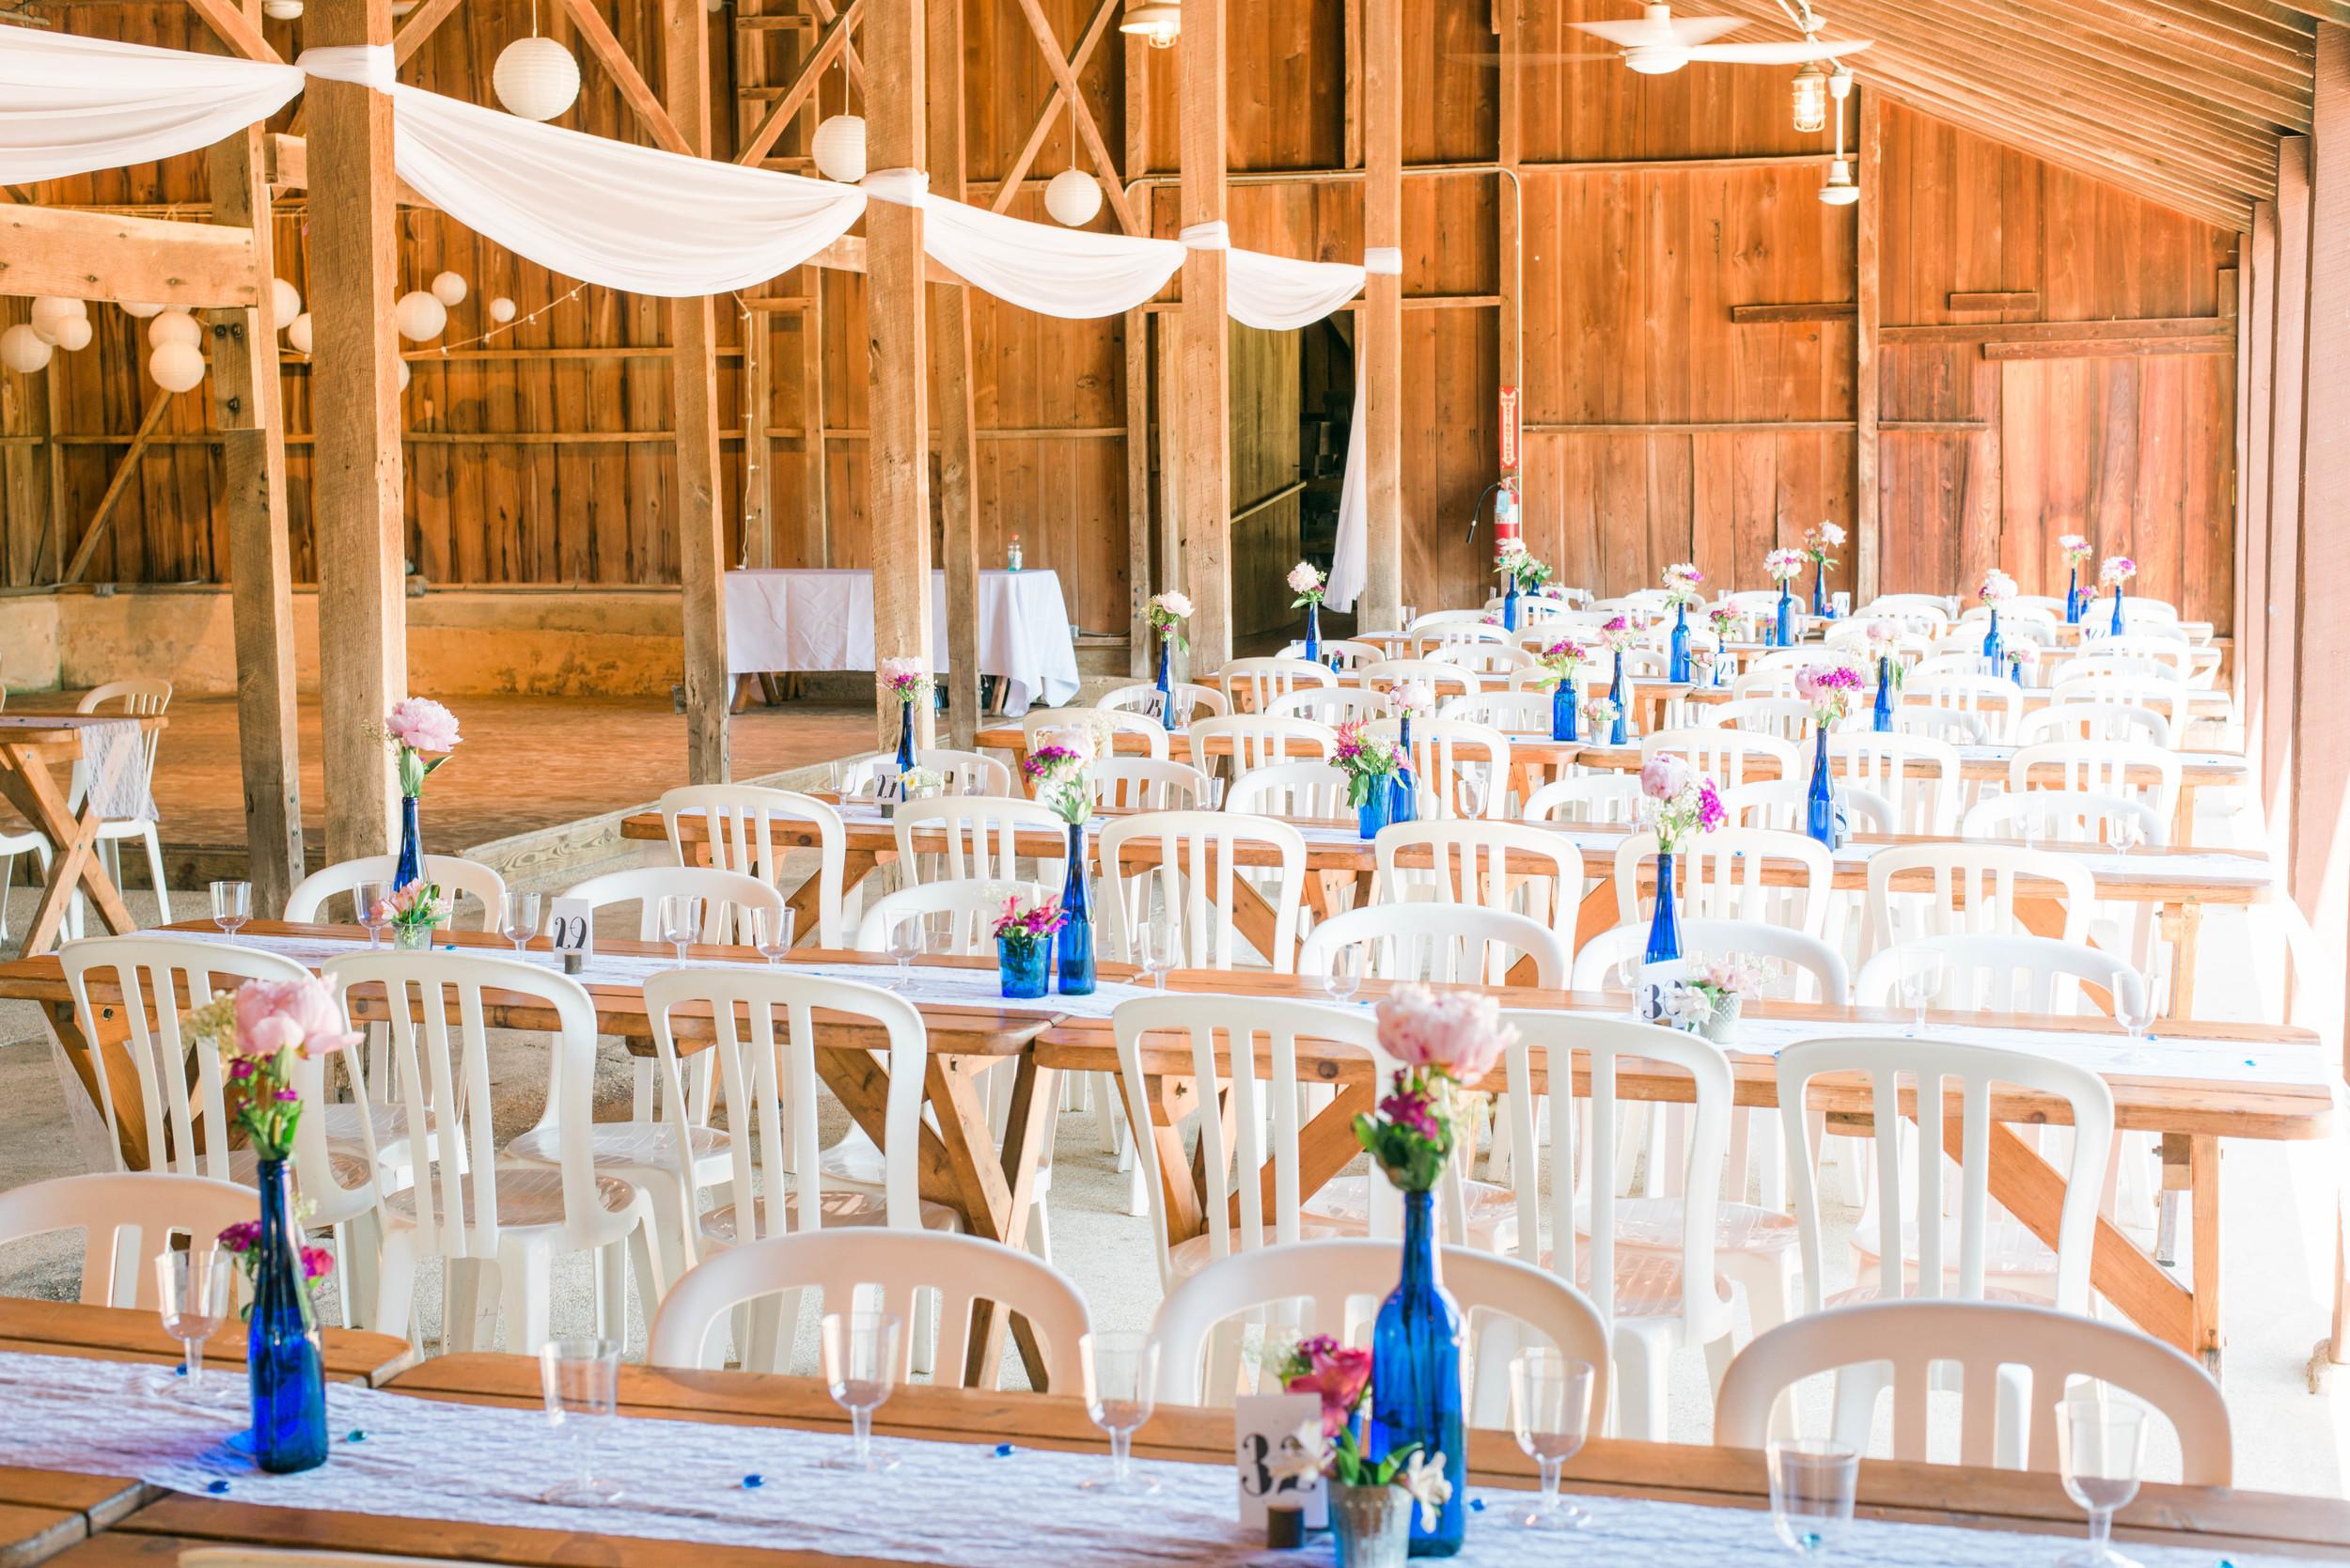 PREVIEWremowedding2016-9.jpg